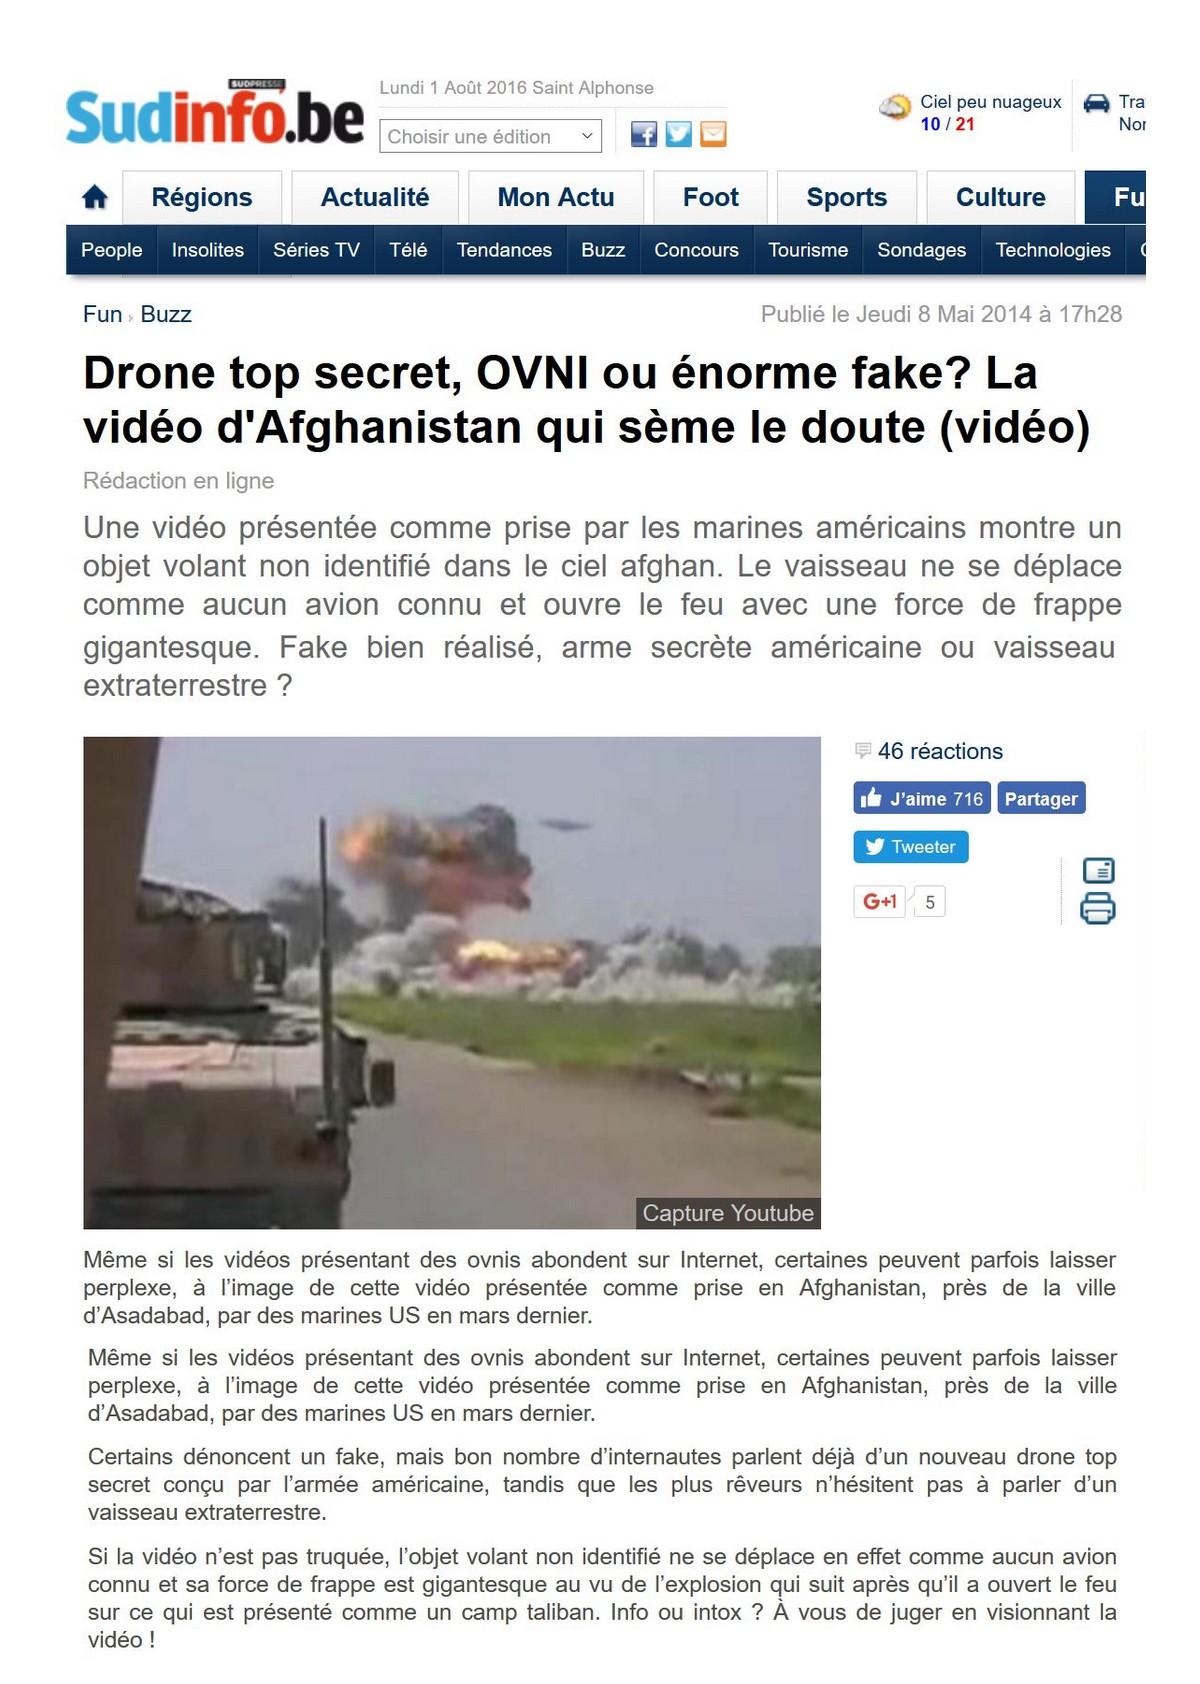 2016-LA VIDEO D'AFGHANISTAN-01